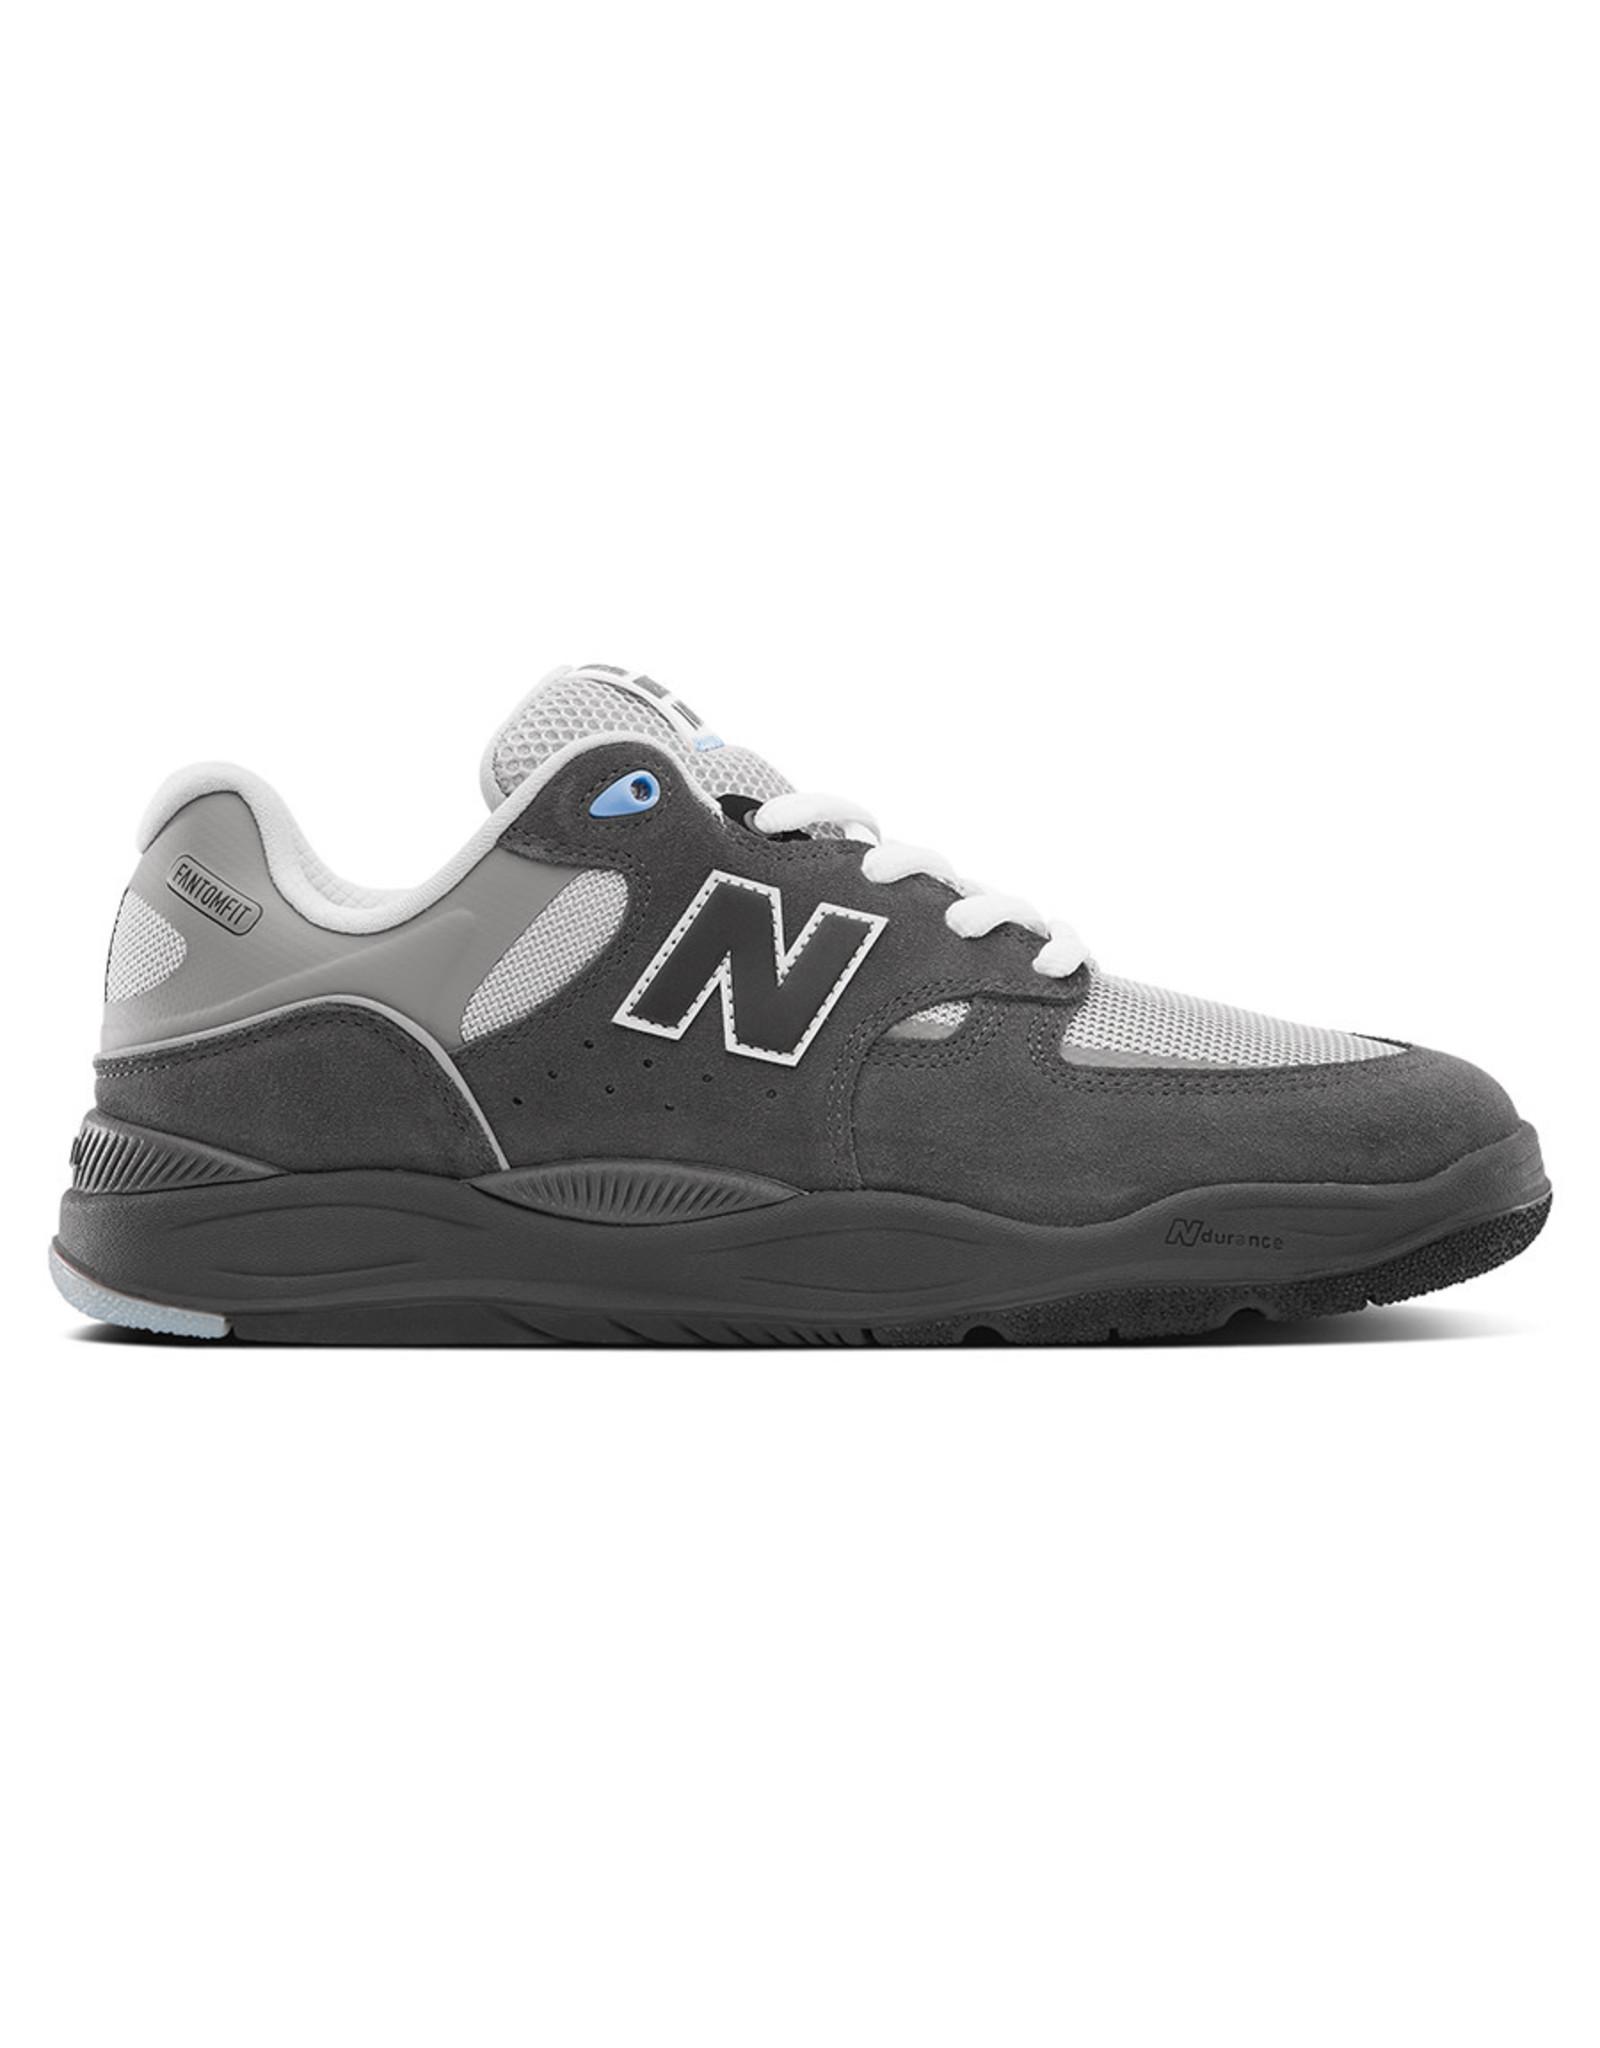 New Balance Numeric New Balance Numeric Shoe 1010 Tiago Lemos (Dark Grey)